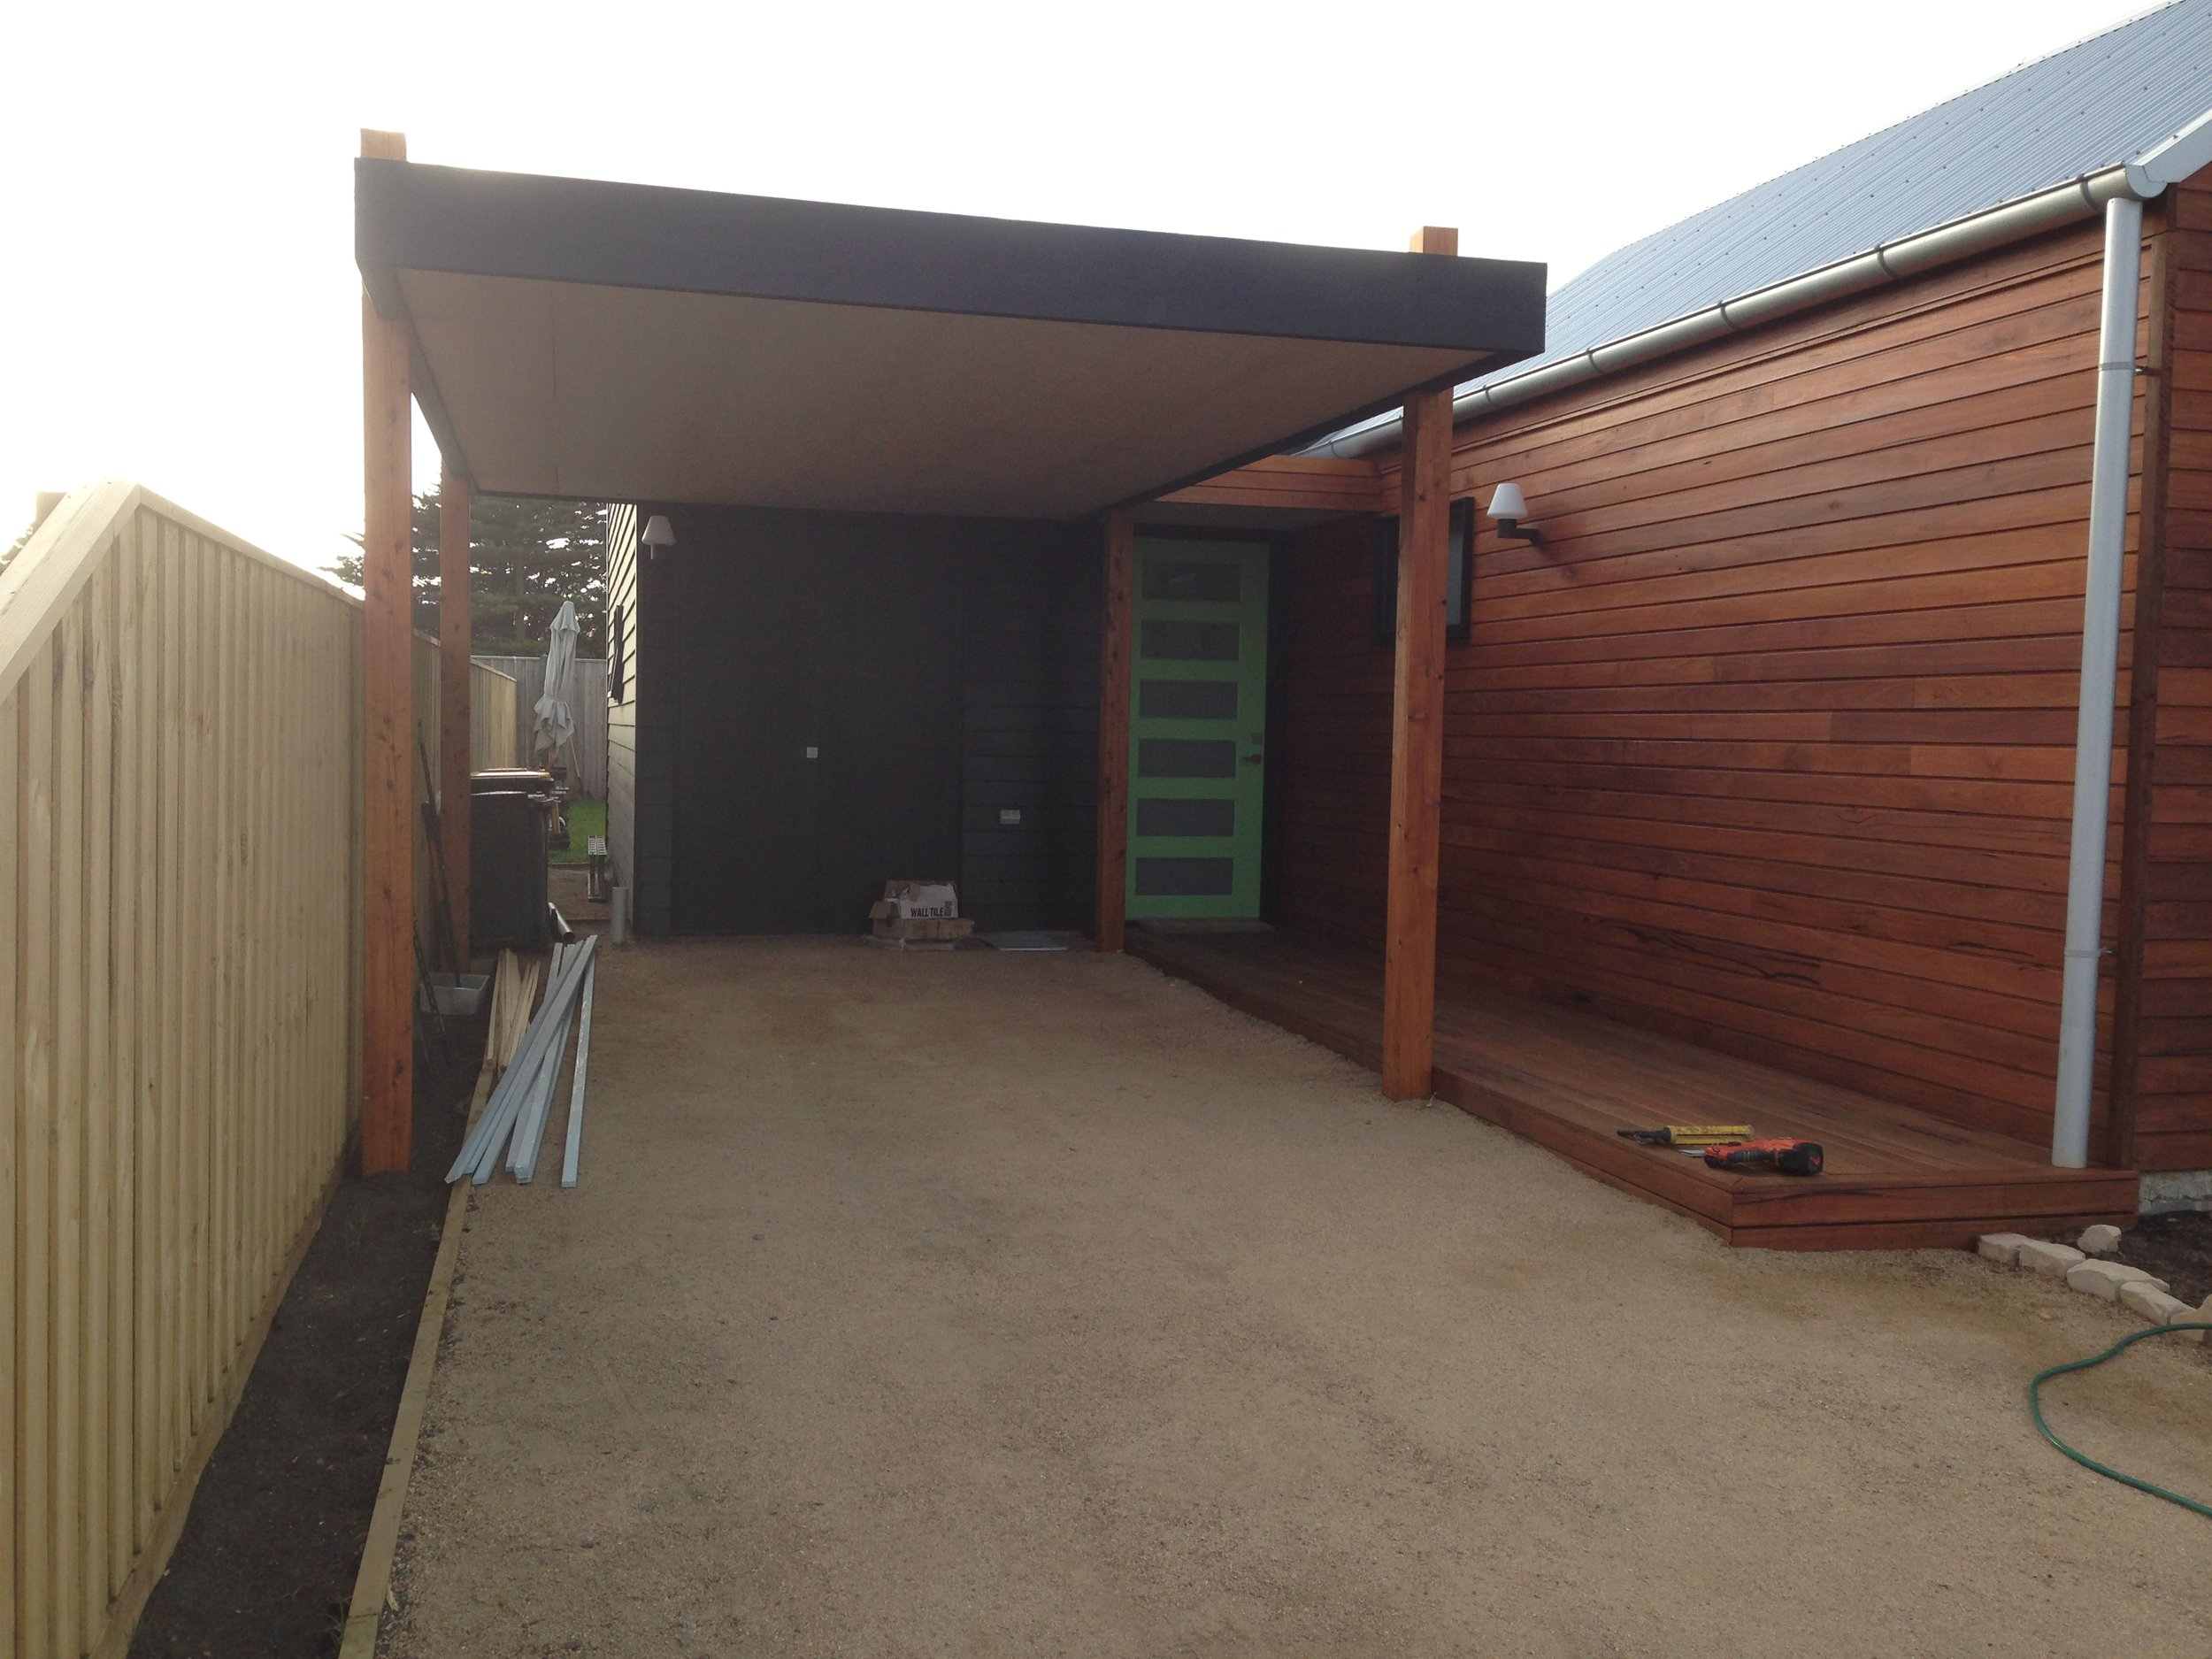 Flat roof carport.